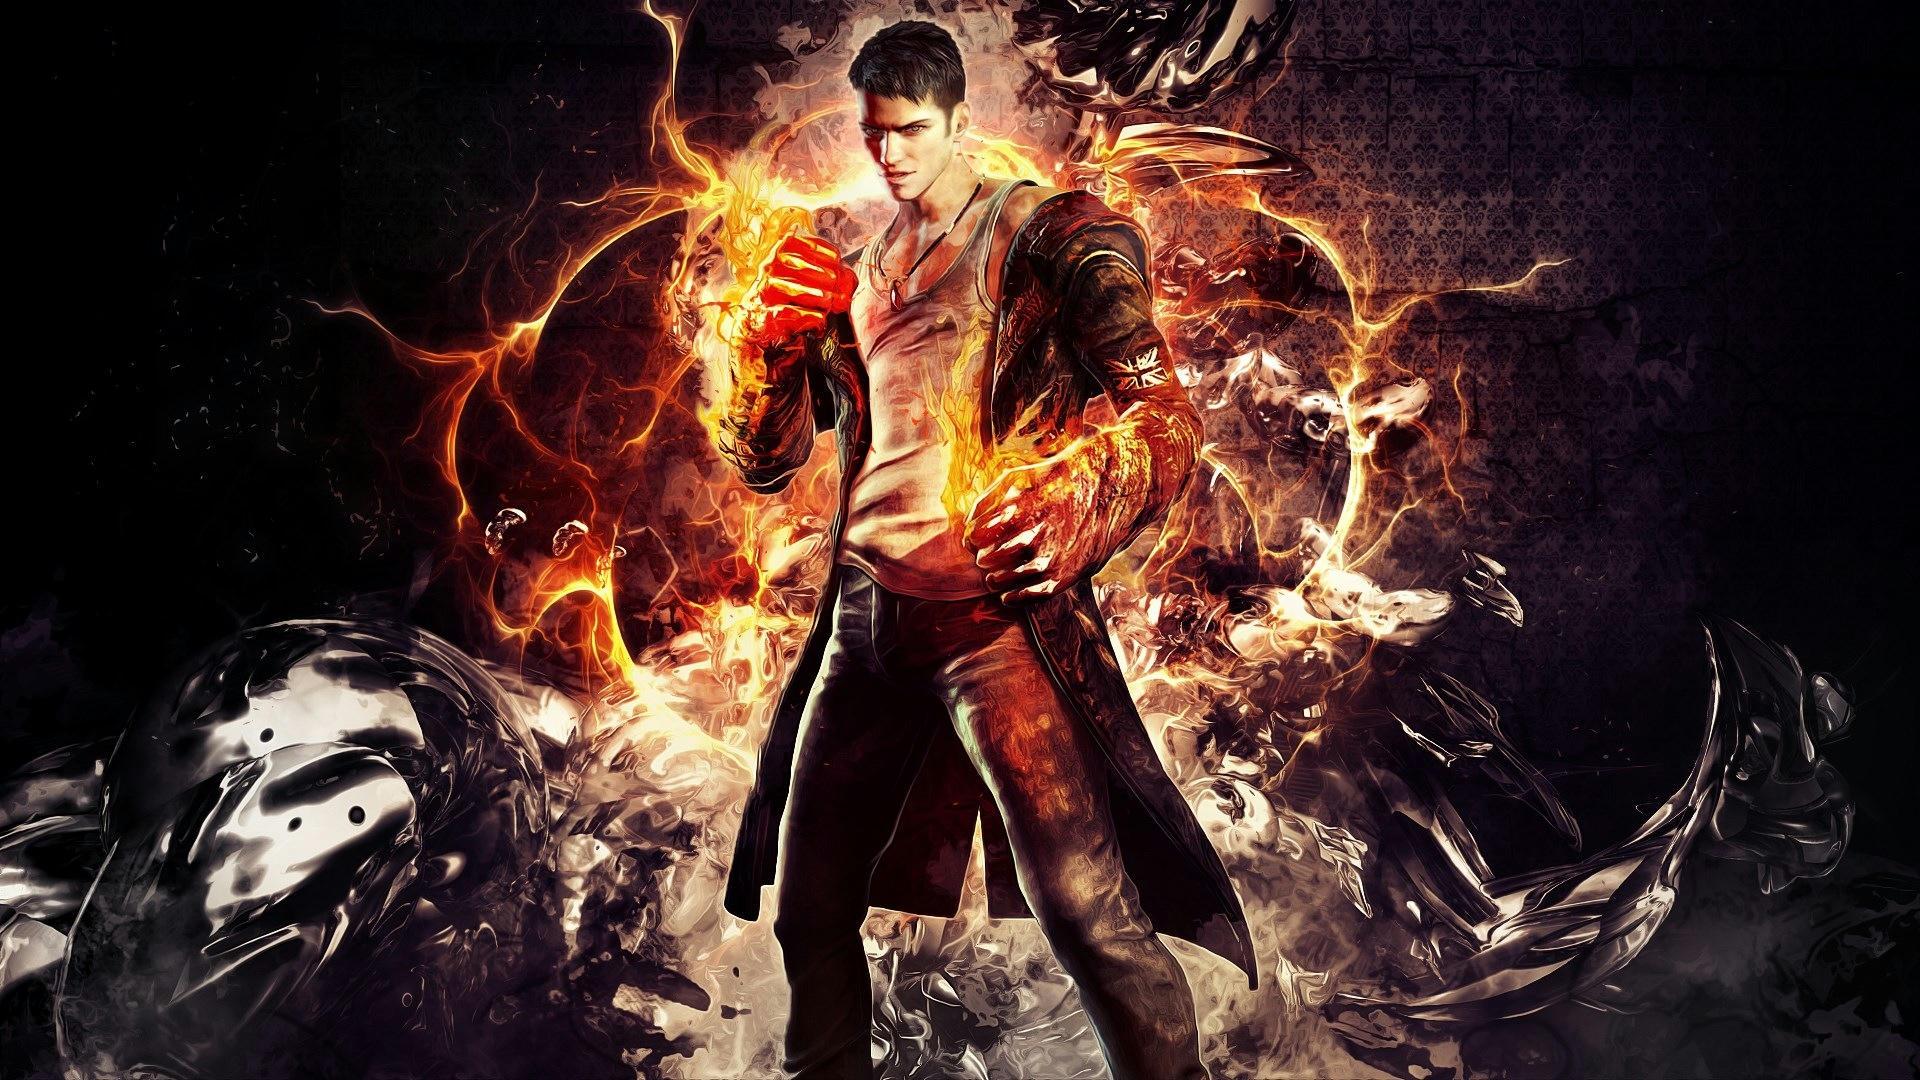 Dante_Devil_Trigger